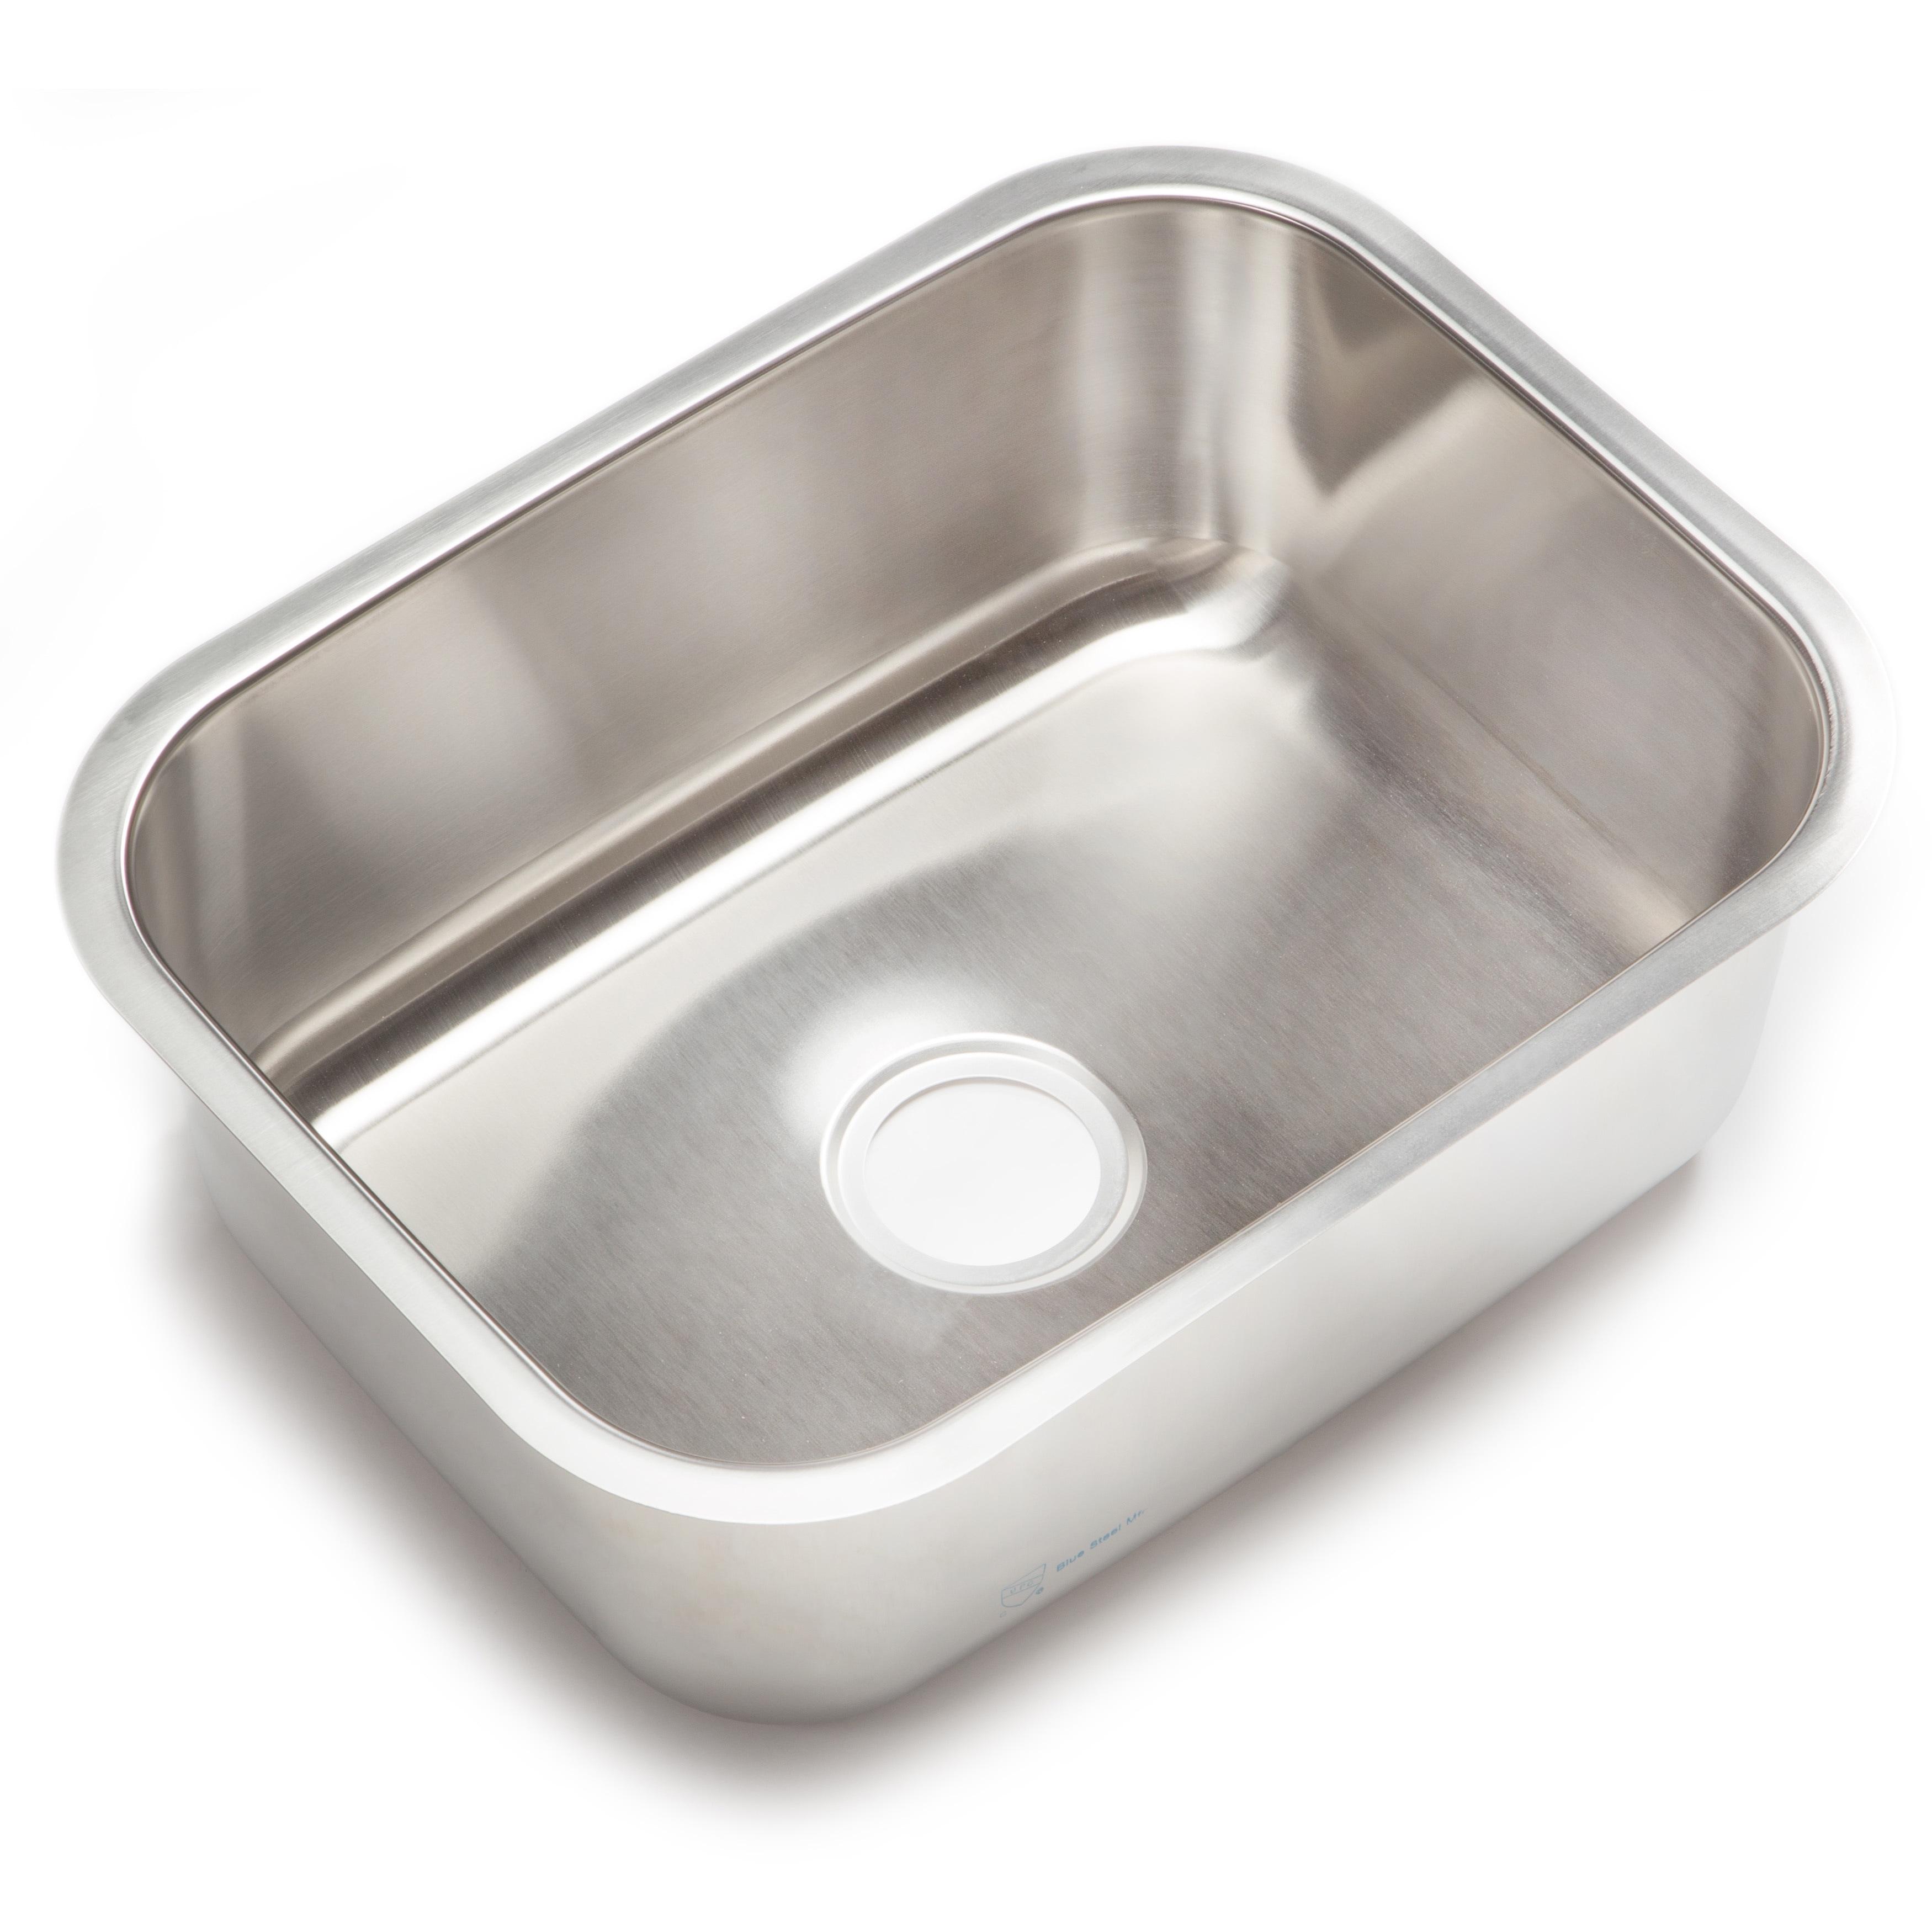 Shop Clark Stainless Steel Large Single-bowl Undermount Kitchen Sink ...